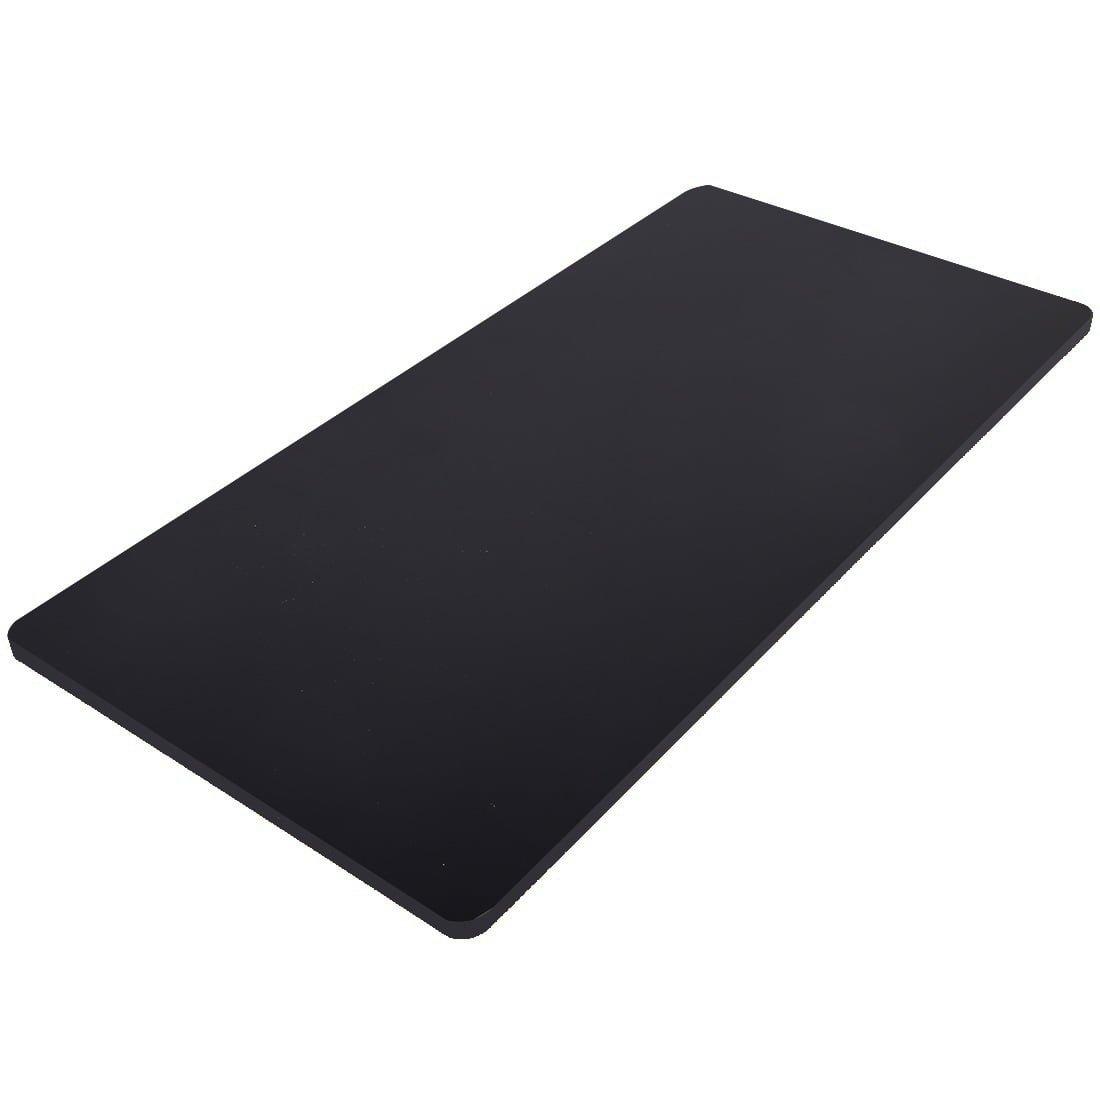 FLEXISPOTオフィステーブル用天板ブラック